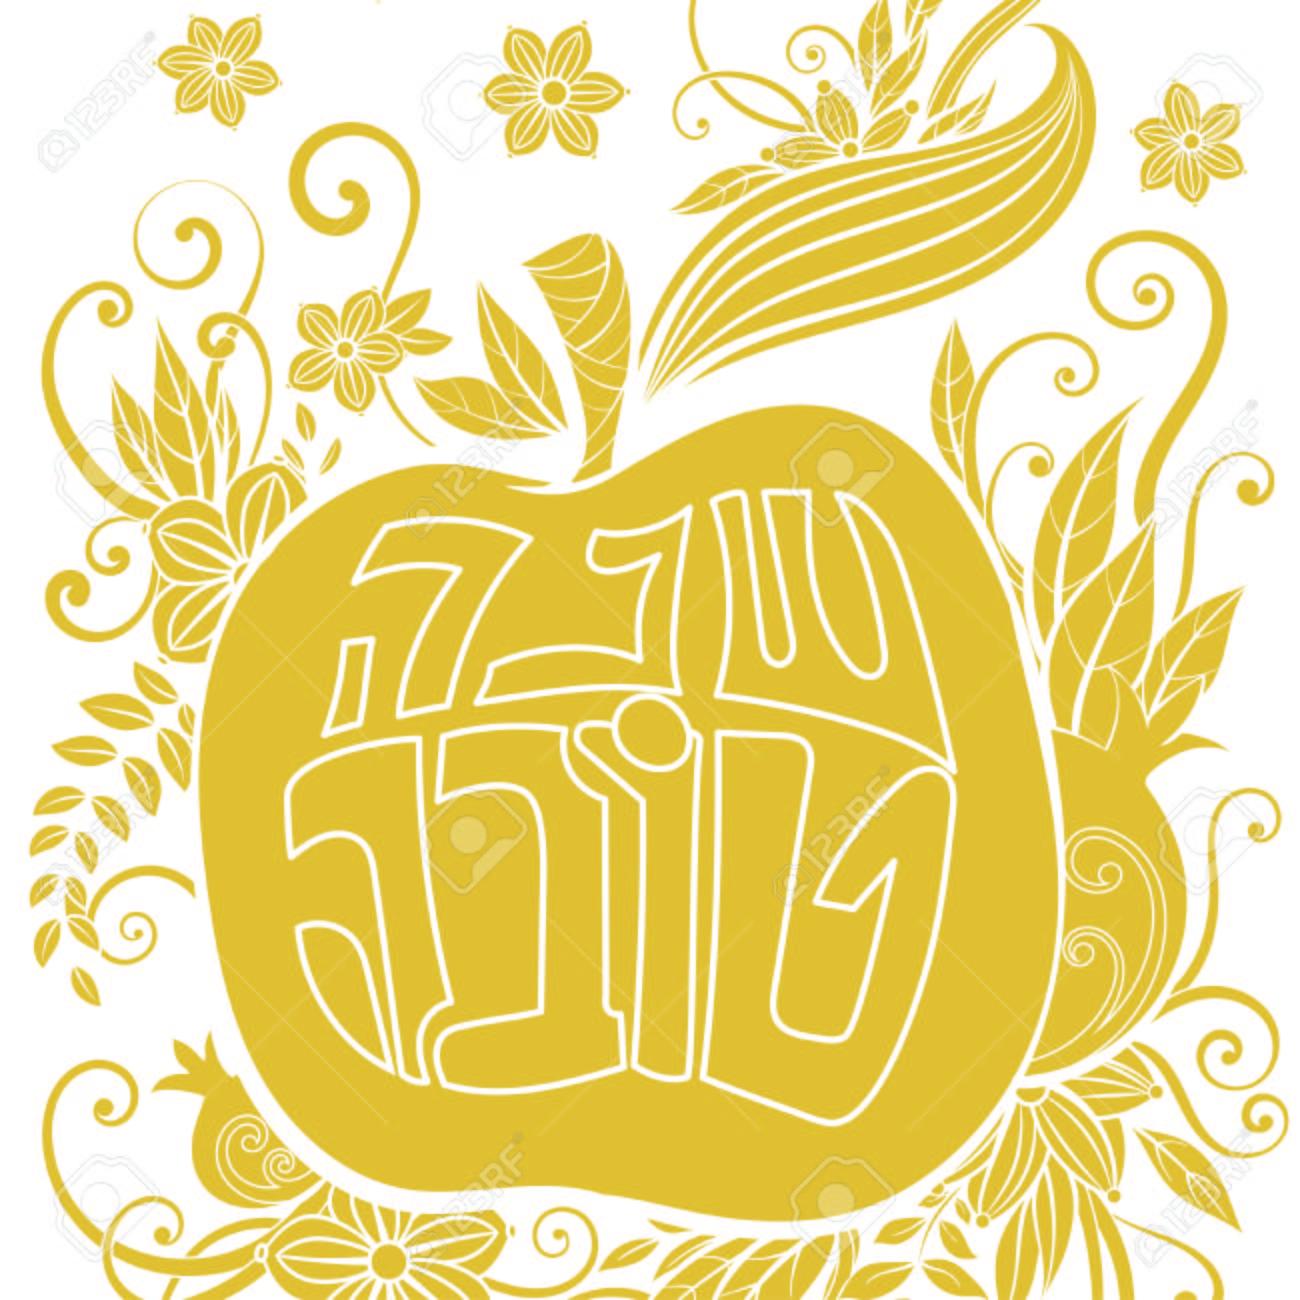 Rosh hashanah jewish new year greeting card design with apple rosh hashanah jewish new year greeting card design with apple and pomegranate greeting text m4hsunfo